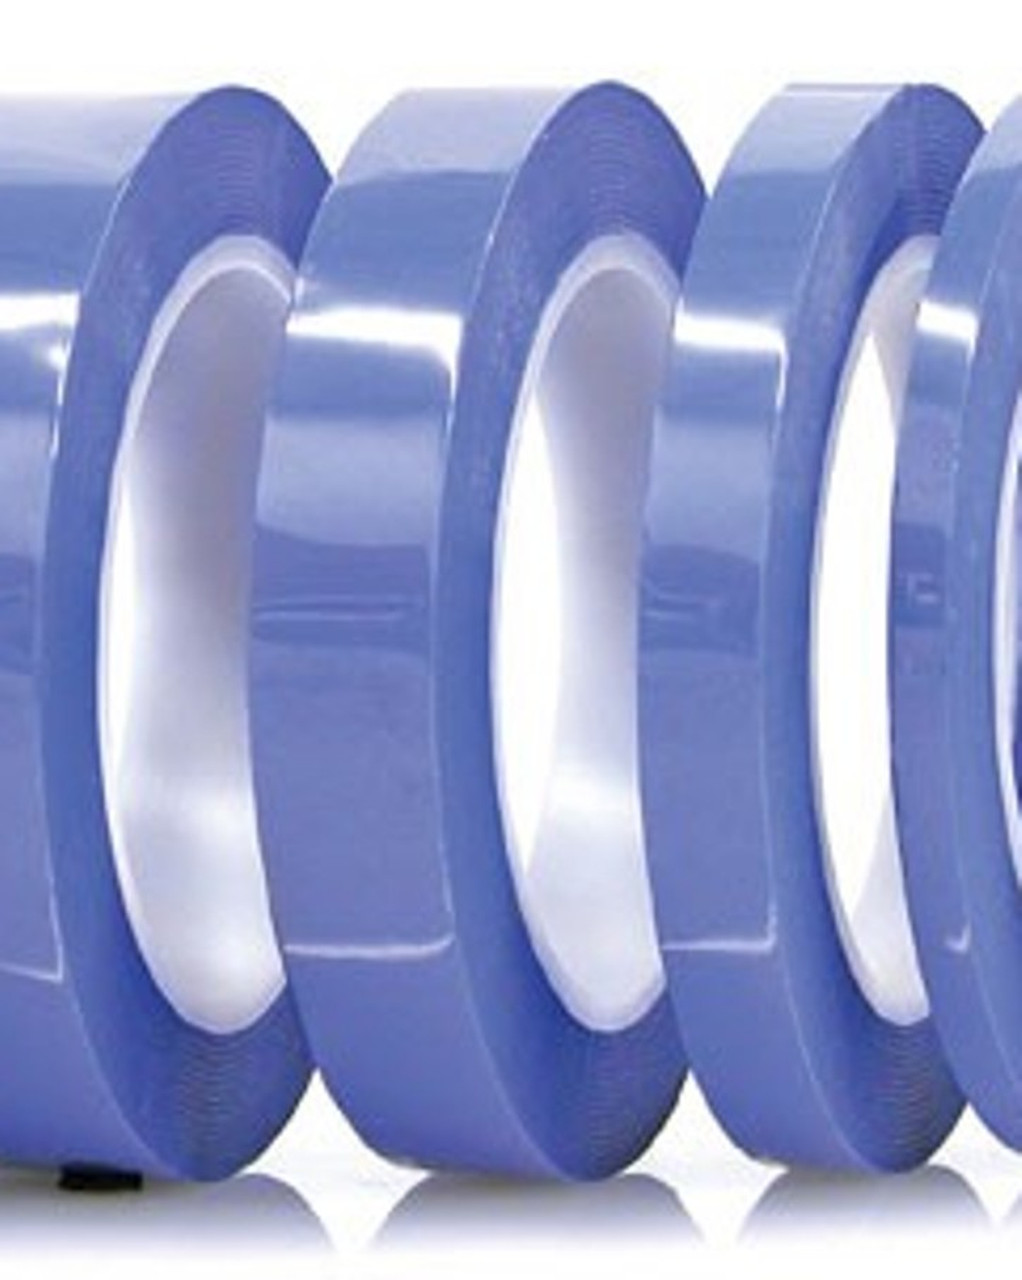 "FLS Blue PCB Plating Tape 1"" x 72yd 273T"